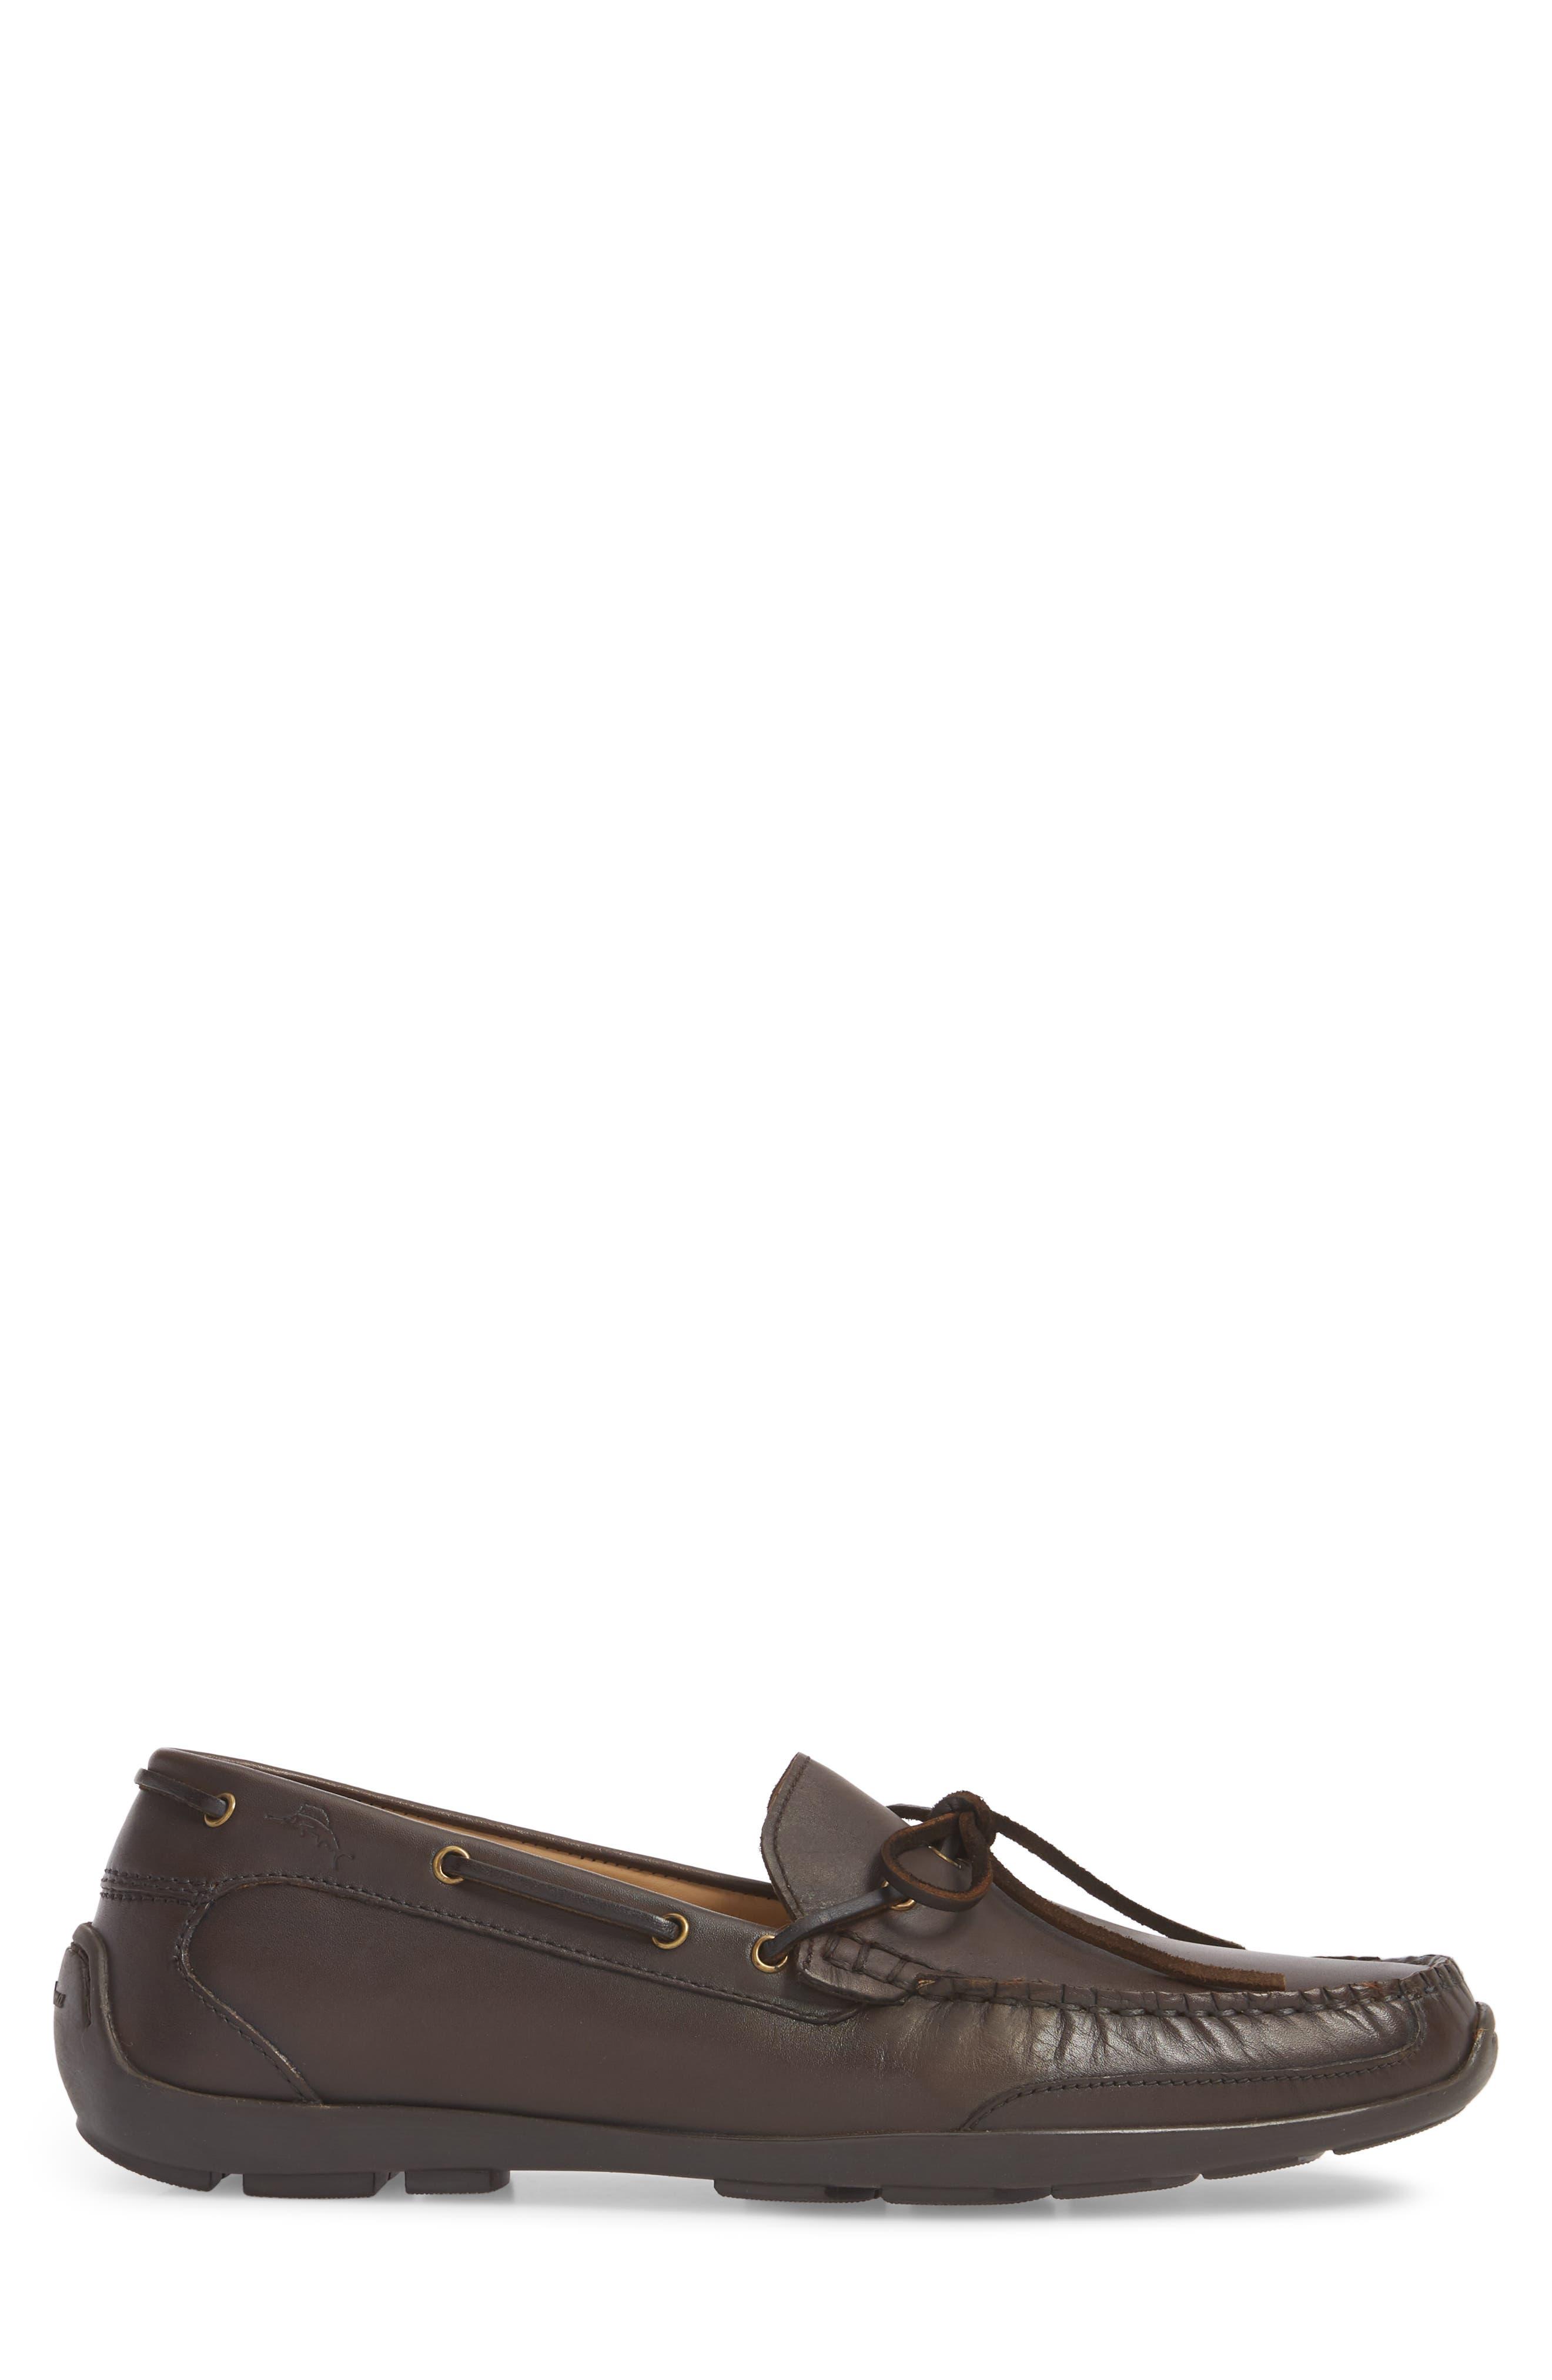 Tangier Driving Shoe,                             Alternate thumbnail 3, color,                             Medium Brown Leather